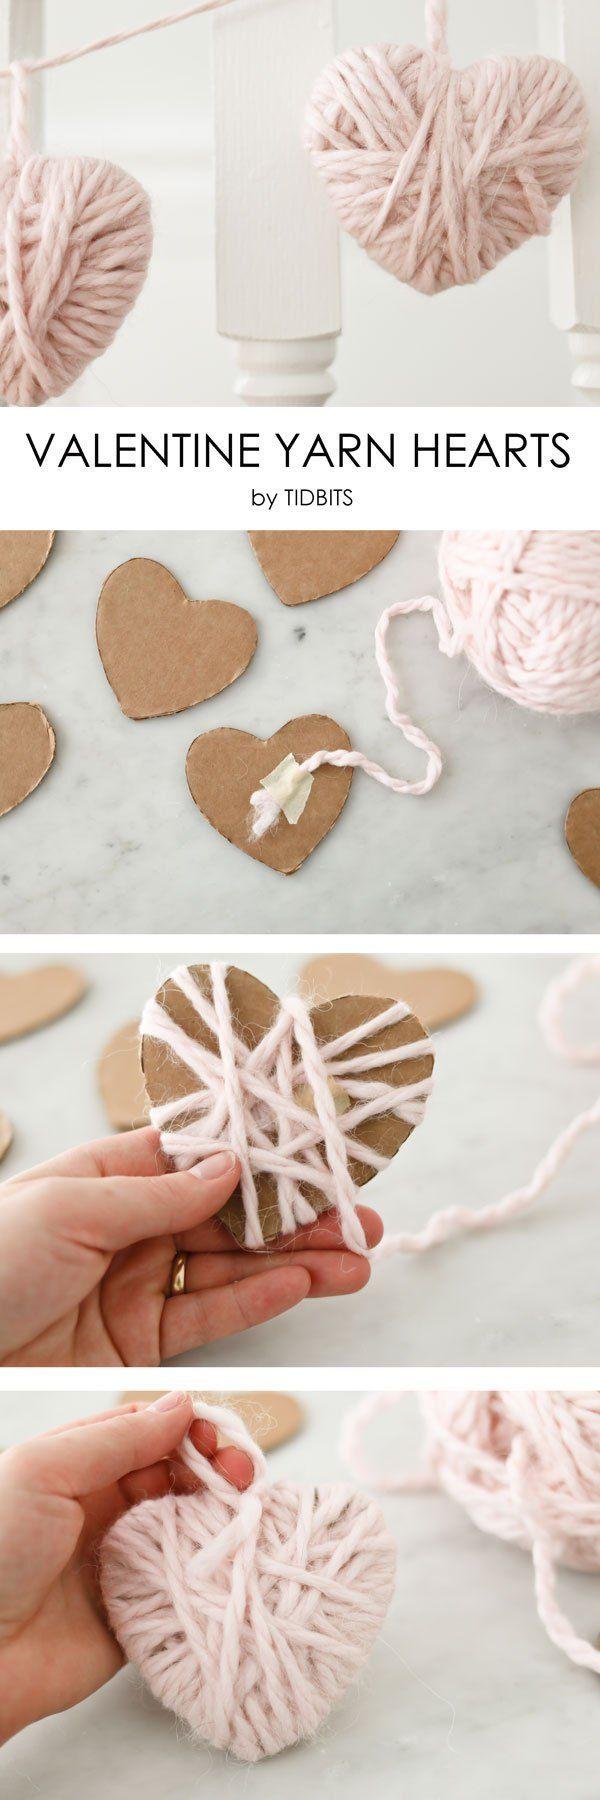 Valentine Yarn Heart - Tidbits